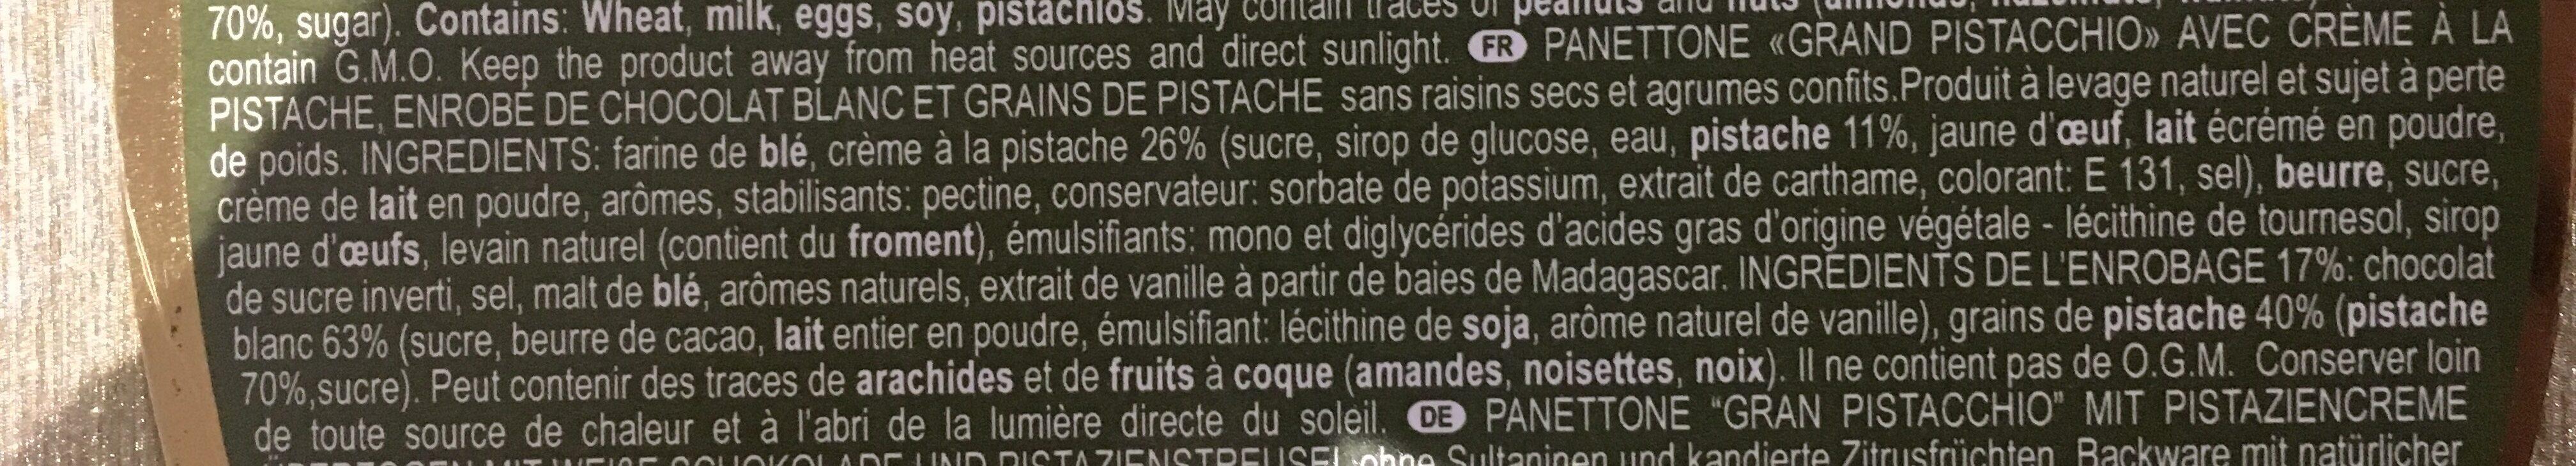 Panettone Artisanal Gran Pistacchio - Ingrédients